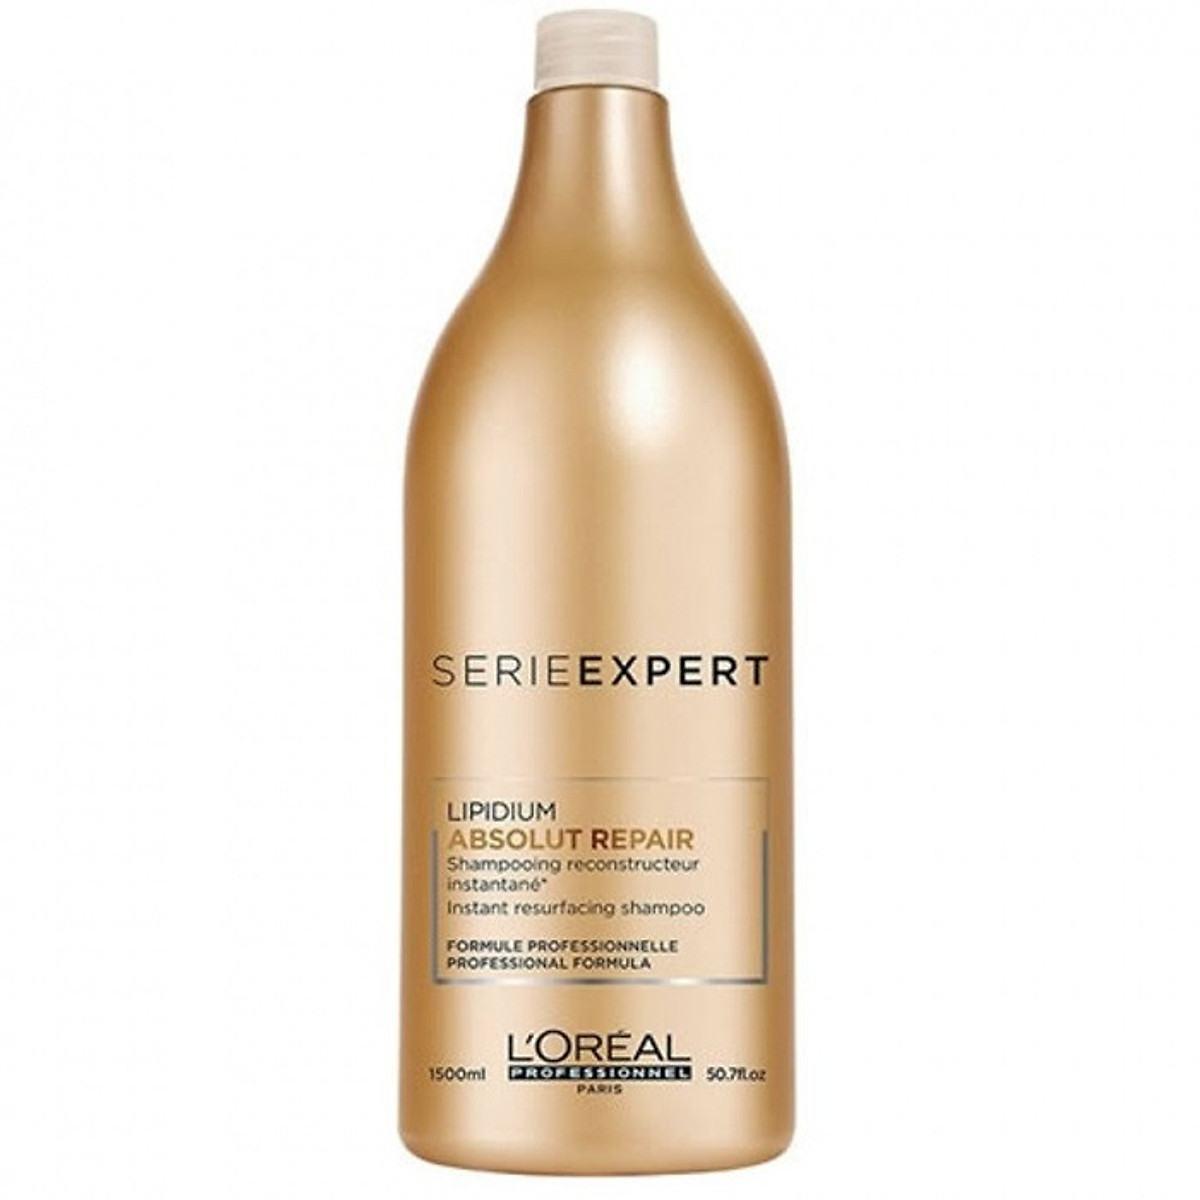 Dầu gội phục hồi tóc L'oreal Serie Expert Absolut Repair Instant resurfacing shampoo 1500ml | Tiki